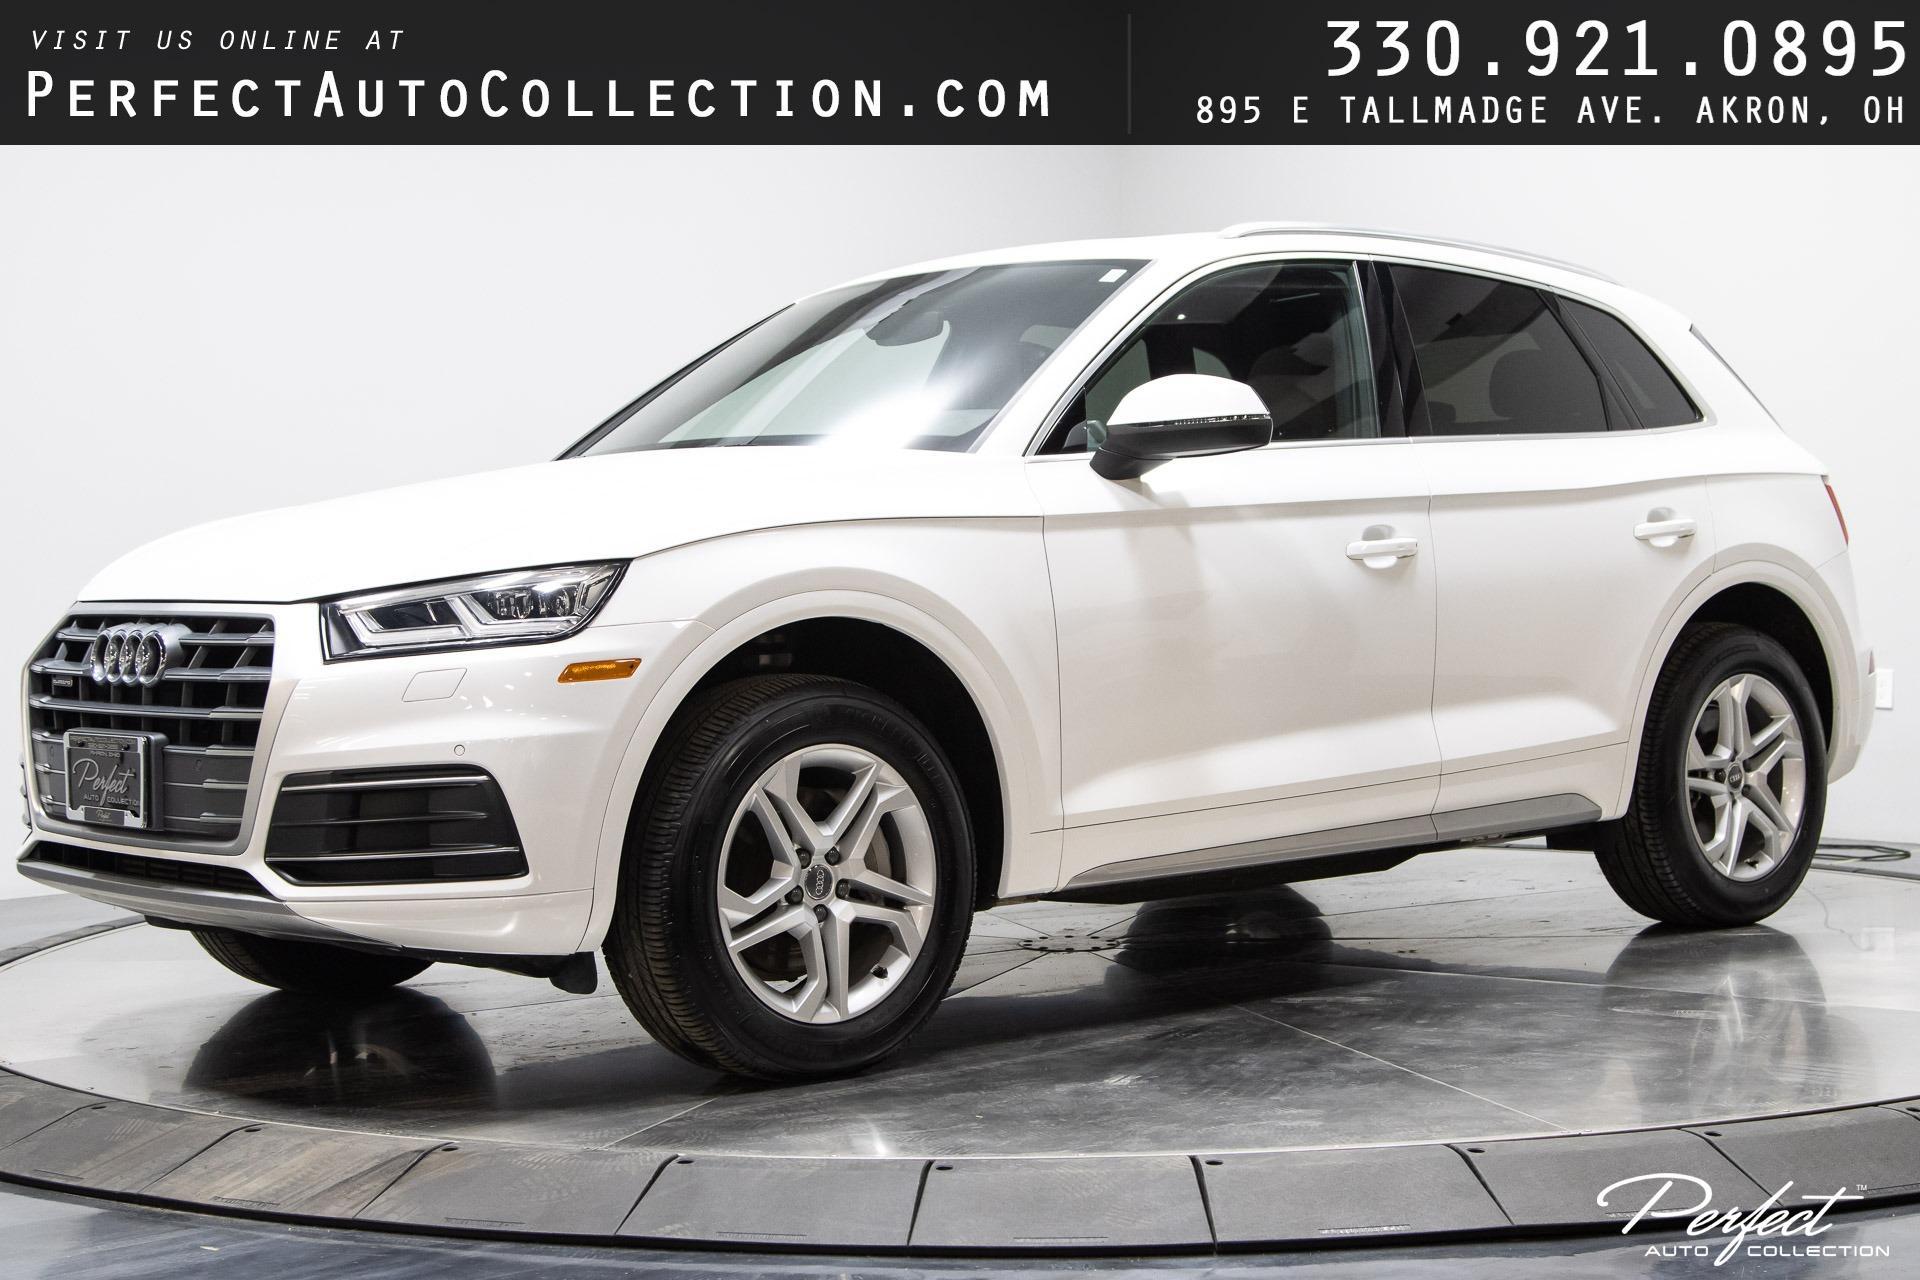 Used 2018 Audi Q5 2.0T quattro Premium Plus for sale $30,995 at Perfect Auto Collection in Akron OH 44310 1